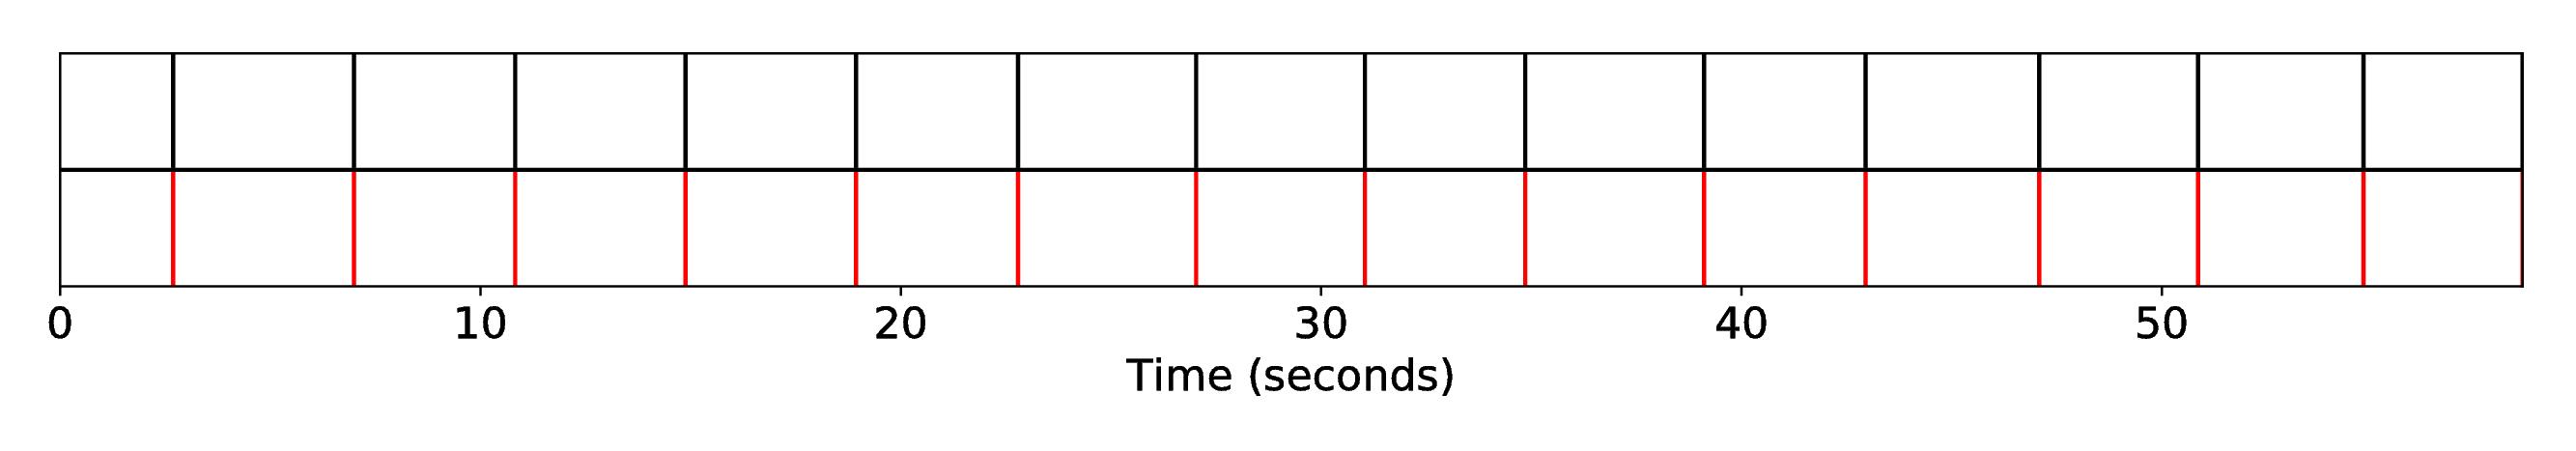 DP1_INT1_R-RW-Snore_m4__S-Fandango__SequenceAlignment